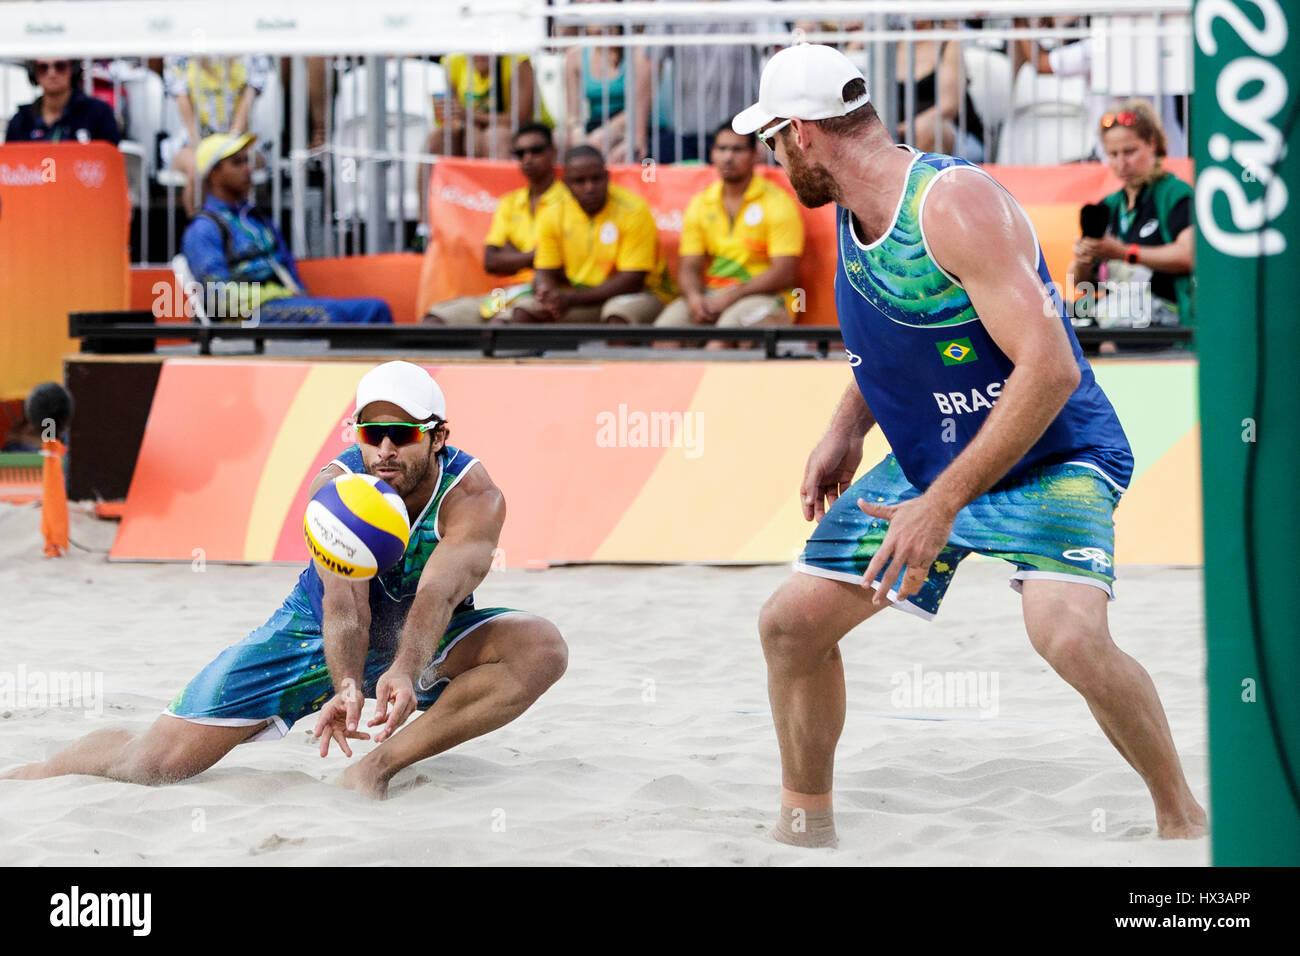 Rio De Janeiro, Brasilien. 15. August 2016 Alison Cerutti-Bruno Schmidt (BRA) Vs Phil Dalhausser ? Nick Lucena (USA) Stockbild